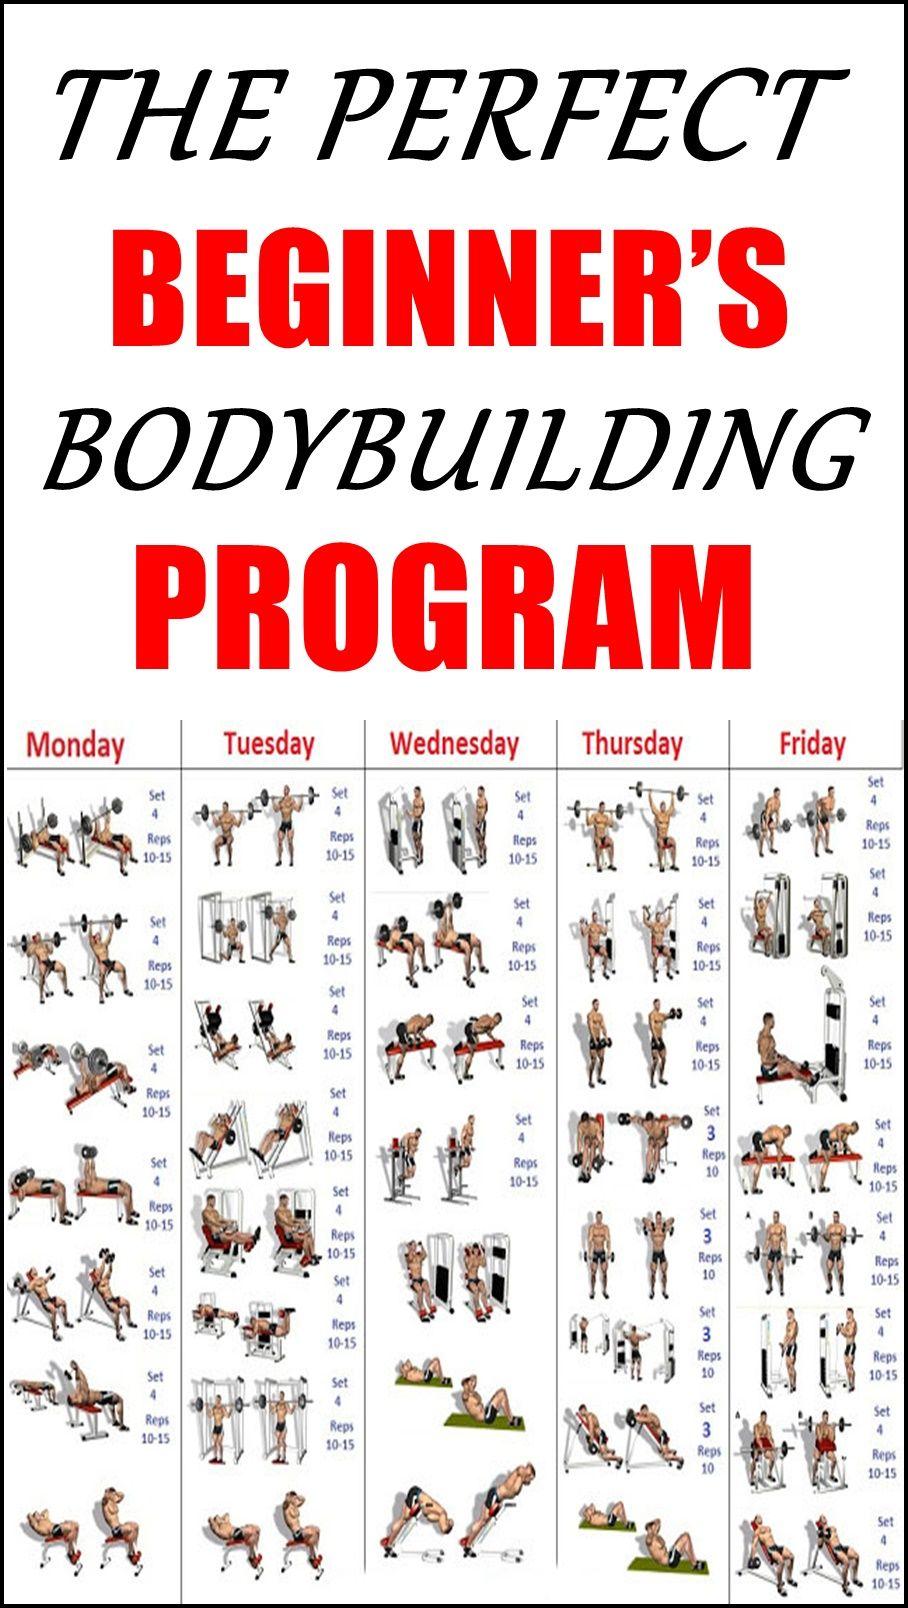 THE PERFECT BEGINNER'S BODYBUILDING PROGRAM | Best pre